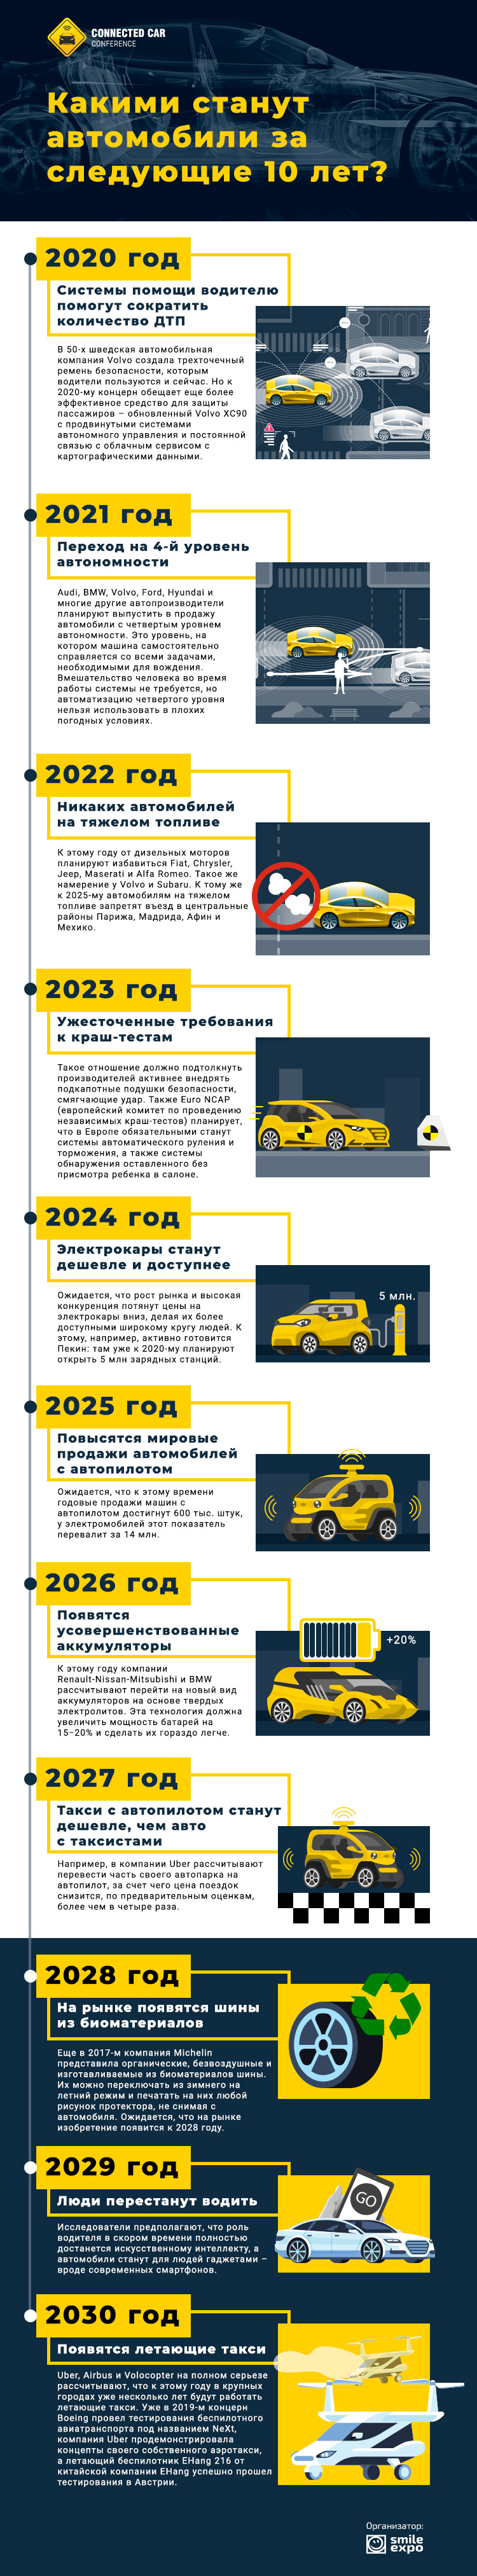 Какими станут автомобили за следующие 10 лет? Инфографика